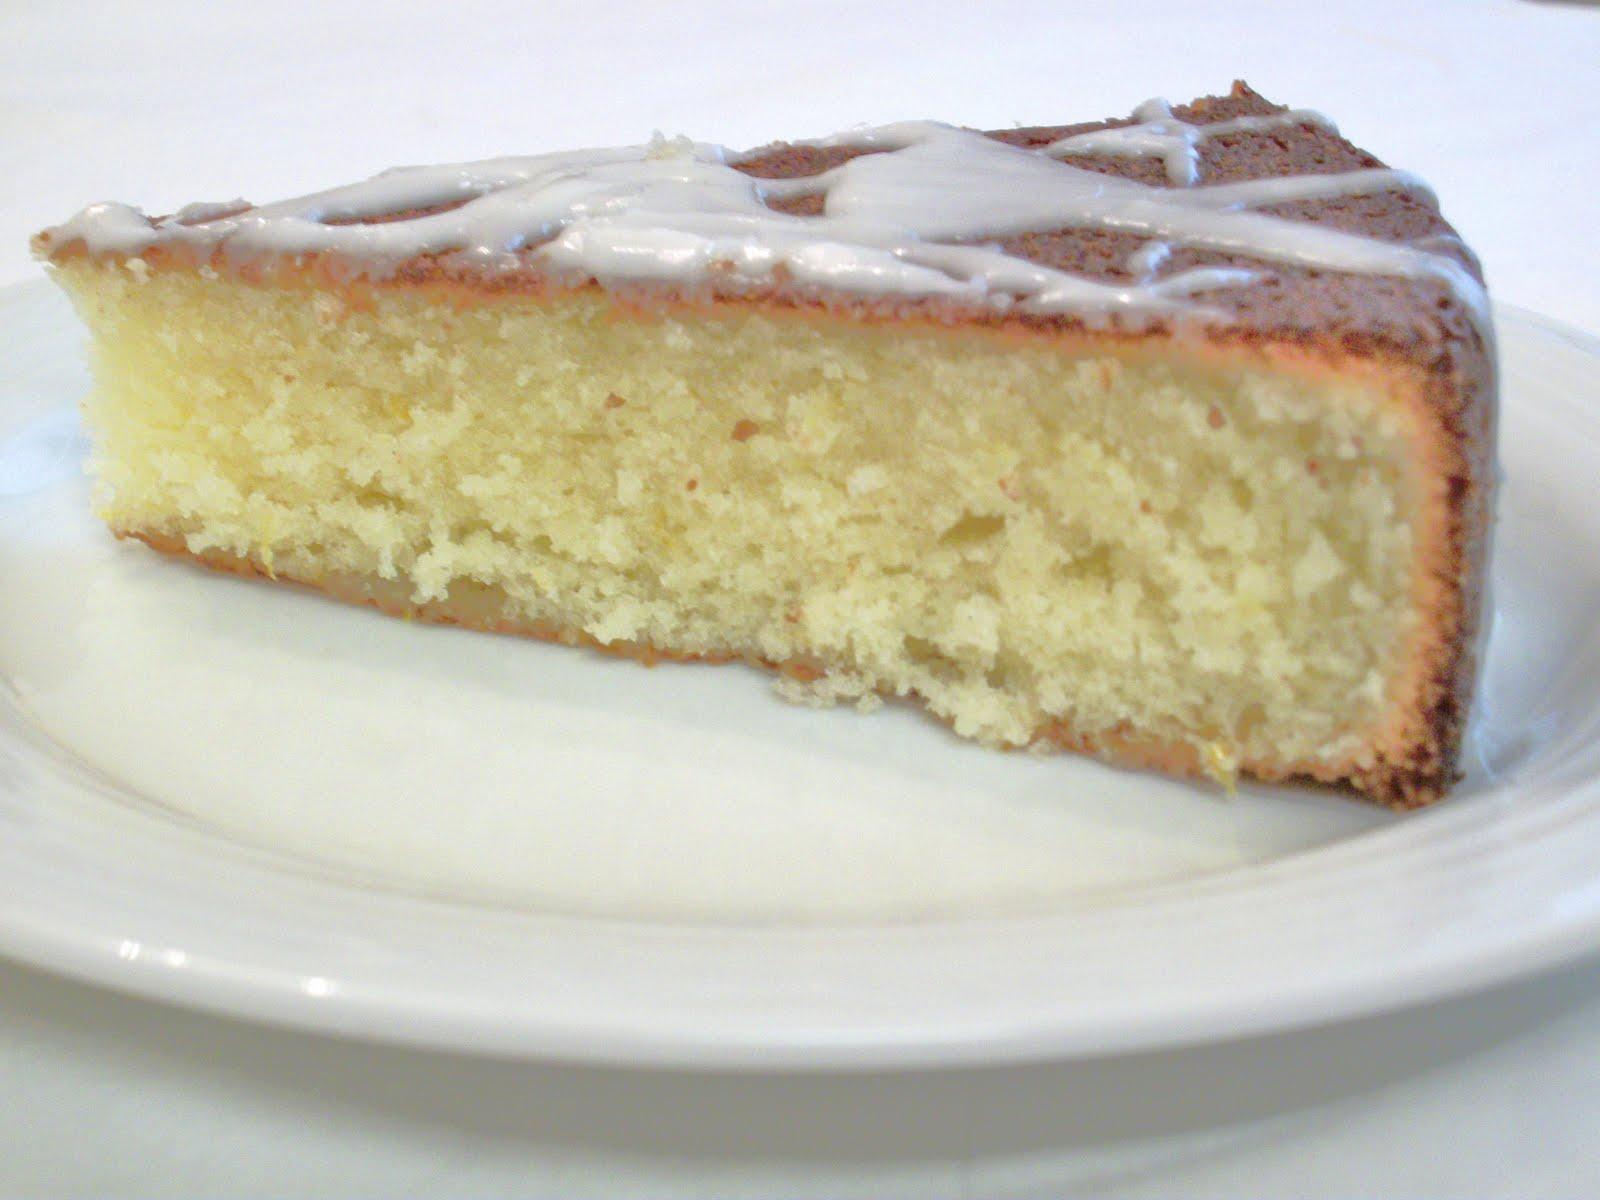 The Big Green Bowl: Meyer Lemon Cake